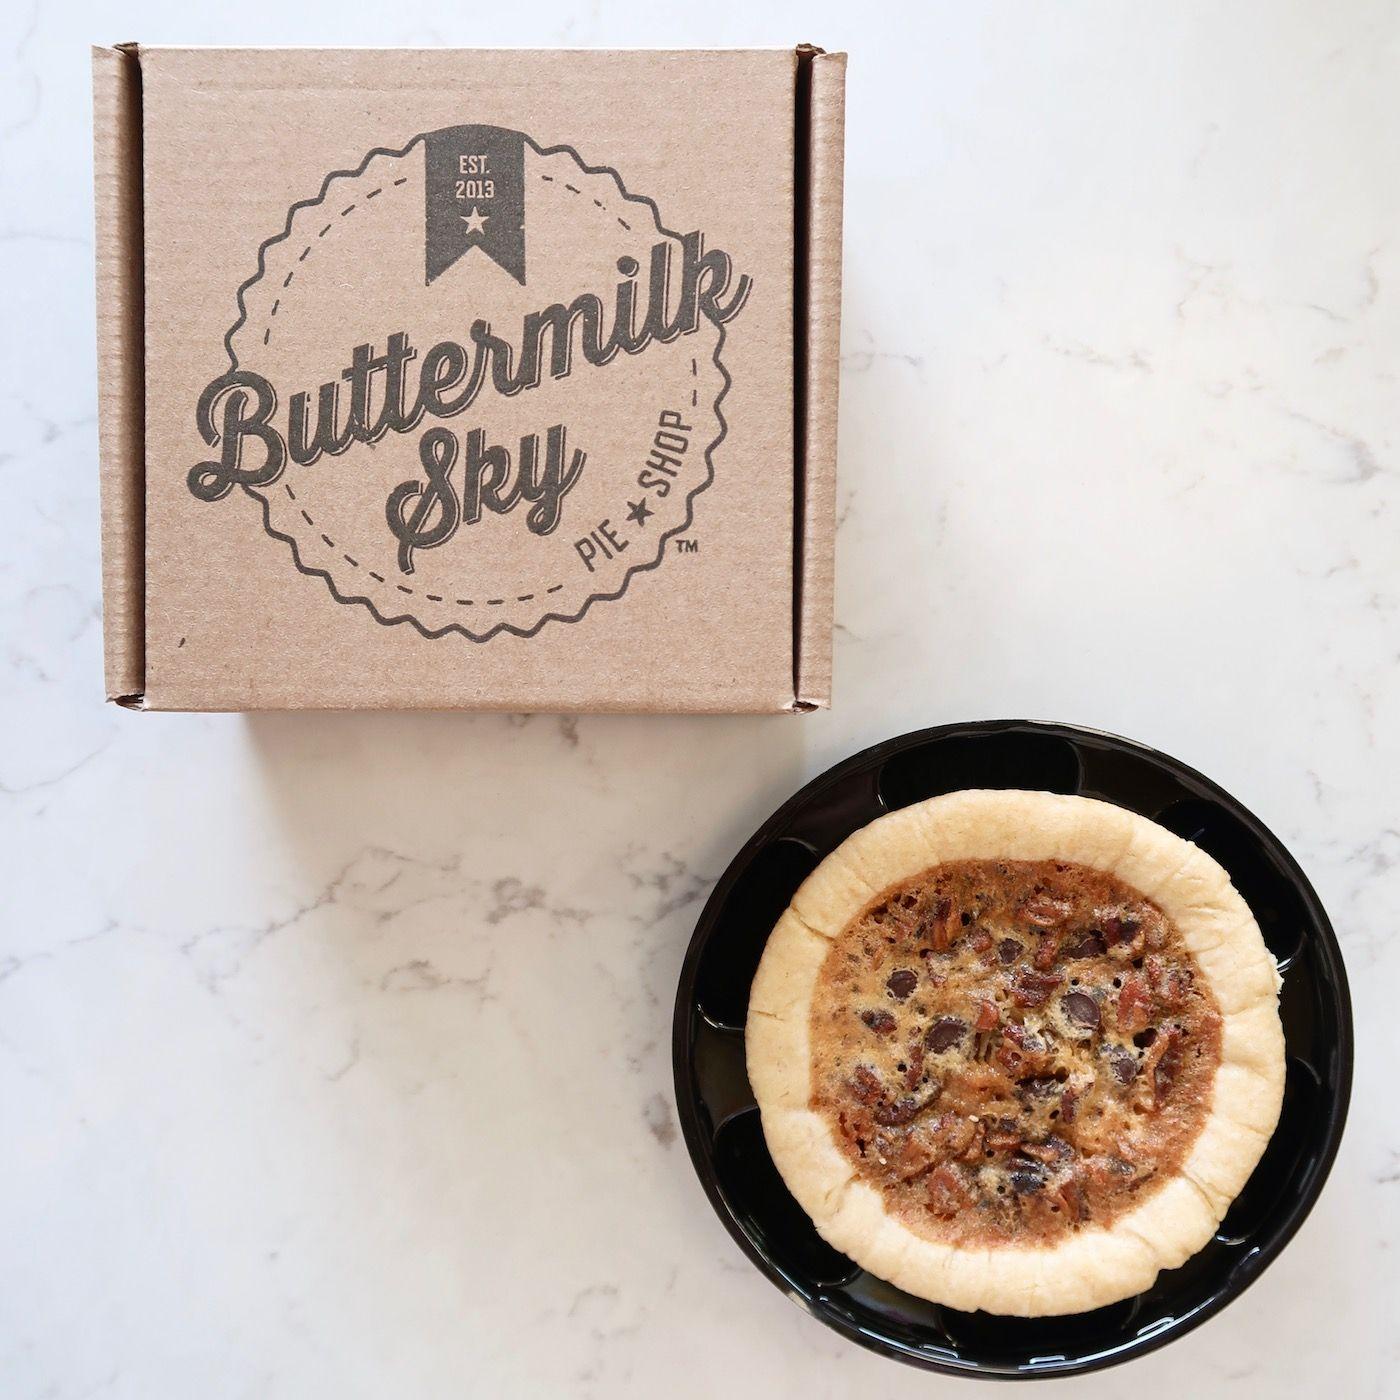 Buttermilk Sky Pie Shop Giveaway The Hive Buttermilk Sky Pie Shop Buttermilk Sky Pie Pie Shop